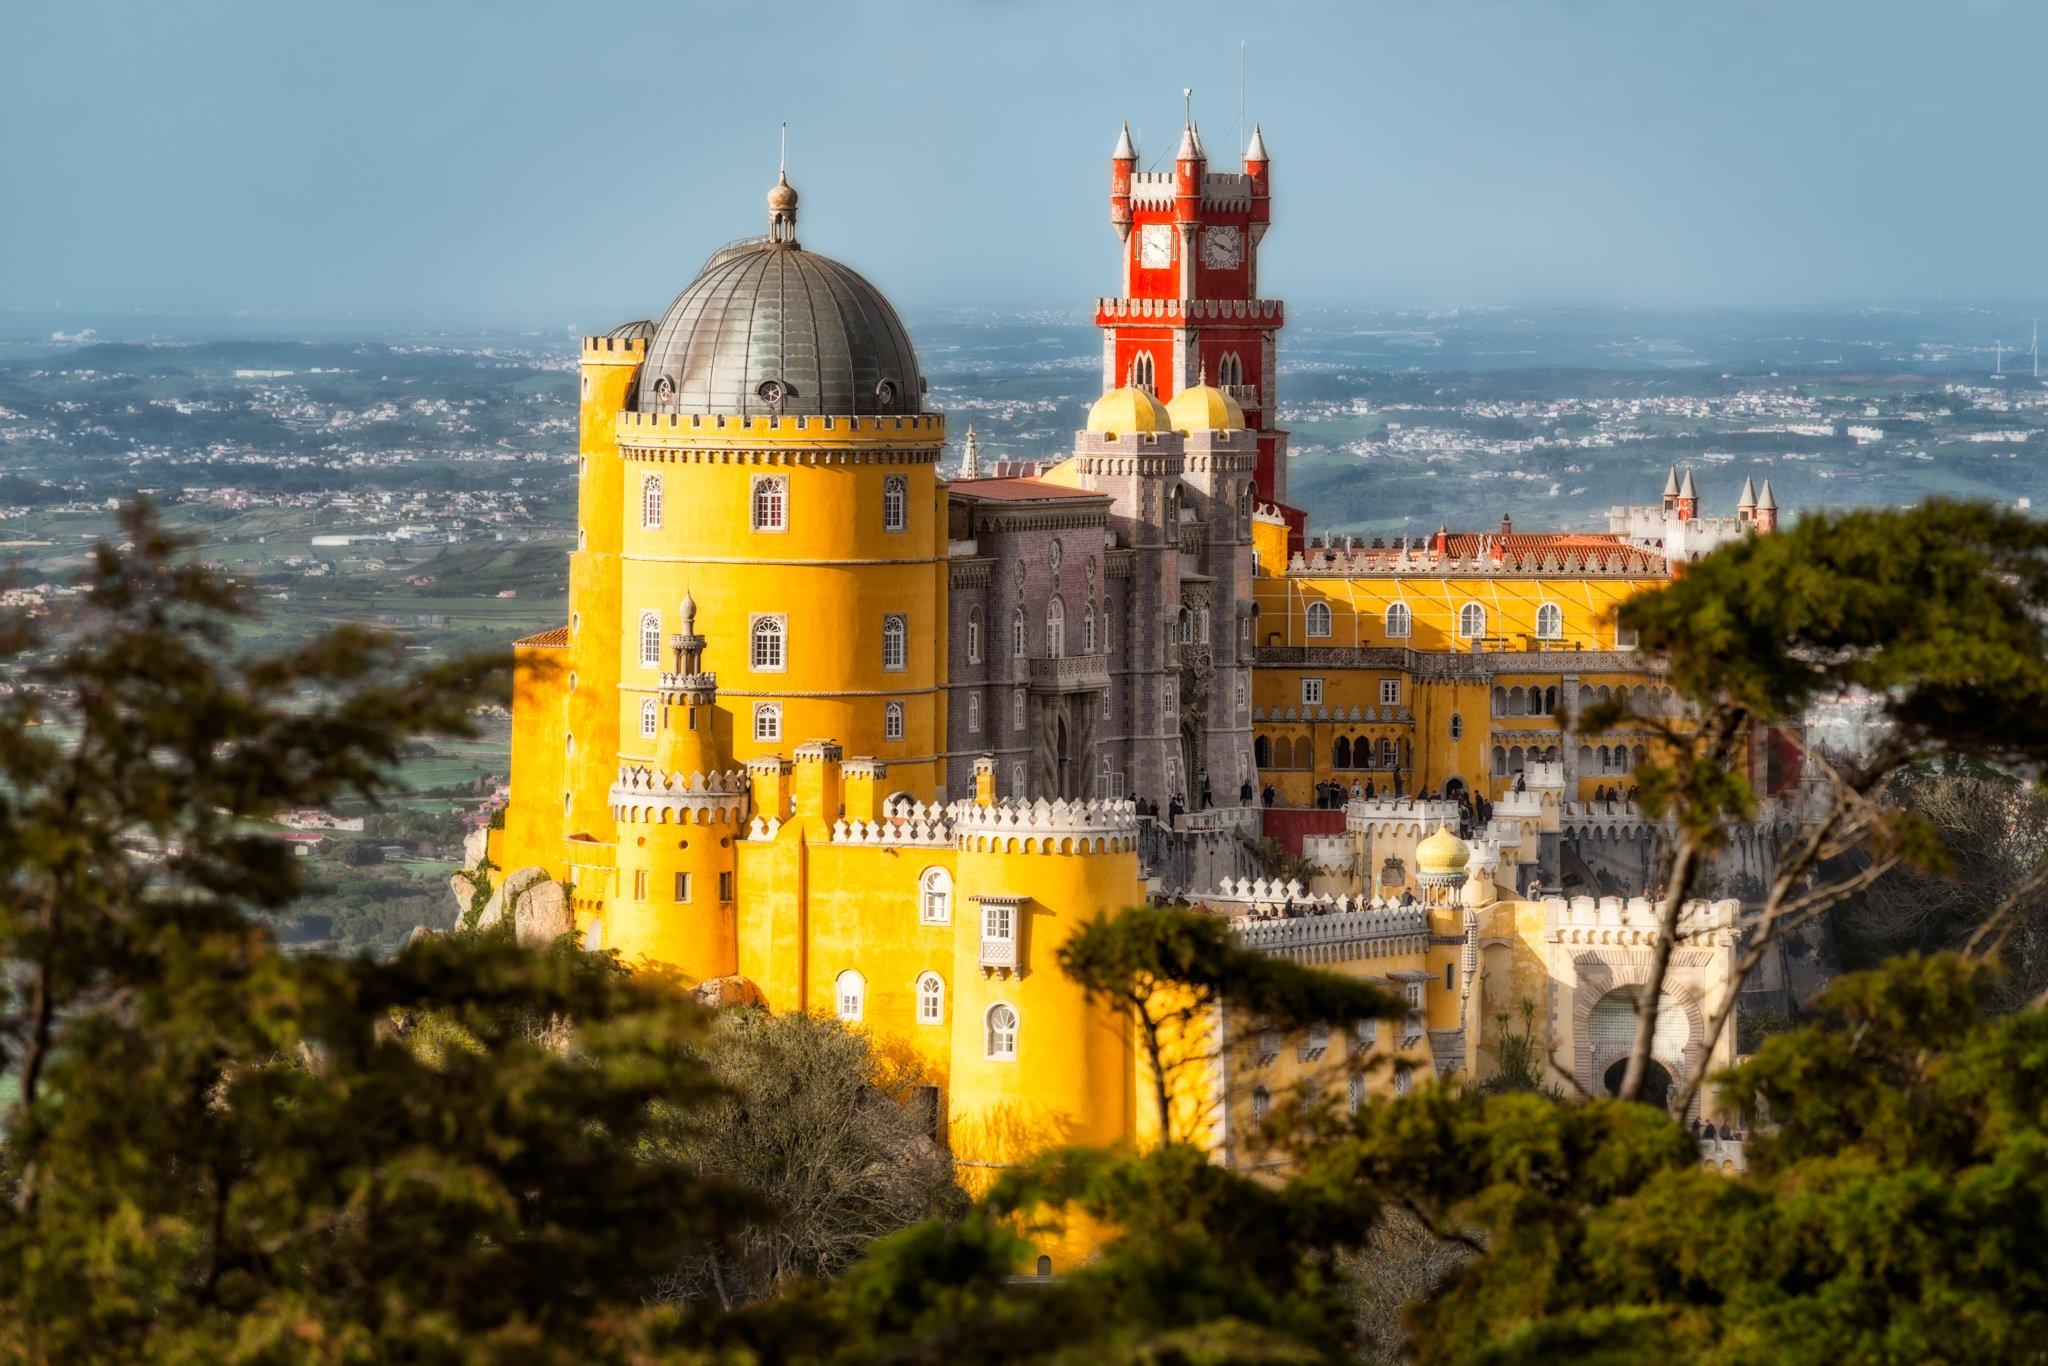 Palácio da Pena in Sintra, Portugal. Zonnig dagzicht vanuit het park.